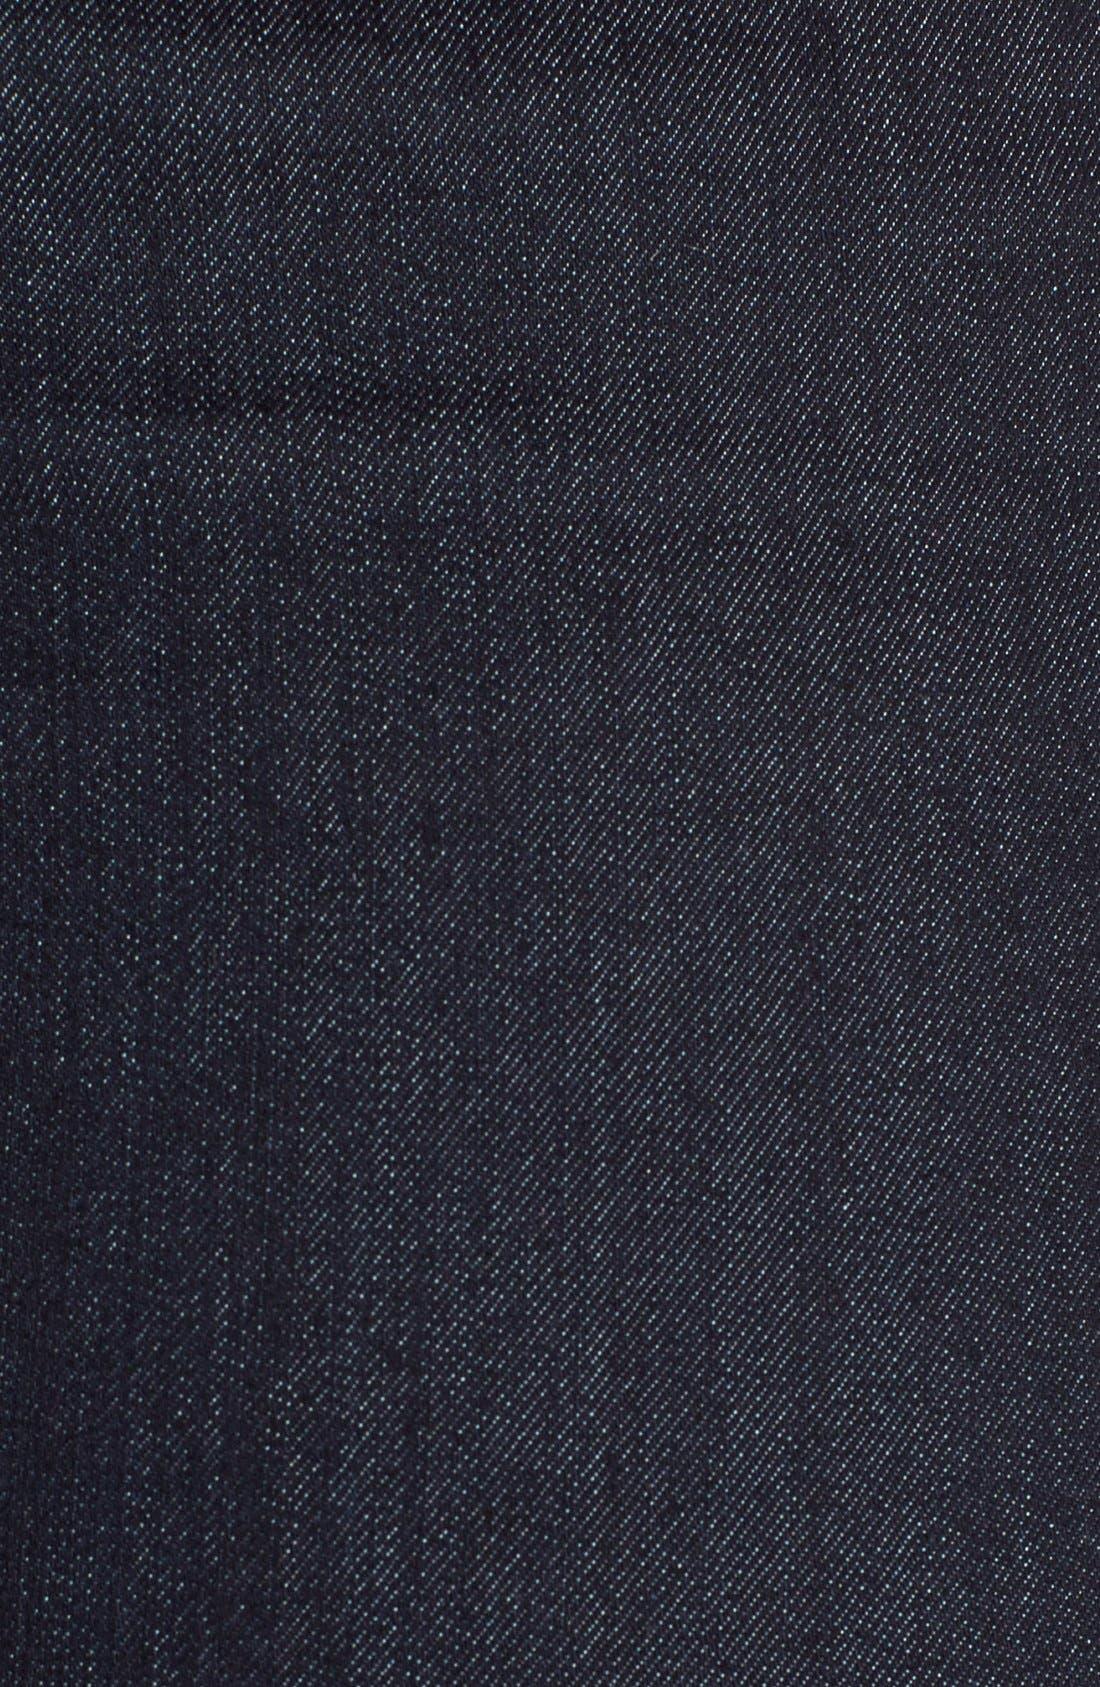 Alternate Image 5  - NYDJ 'Briella' Stretch Roll Cuff Denim Shorts (Dark) (Plus Size)